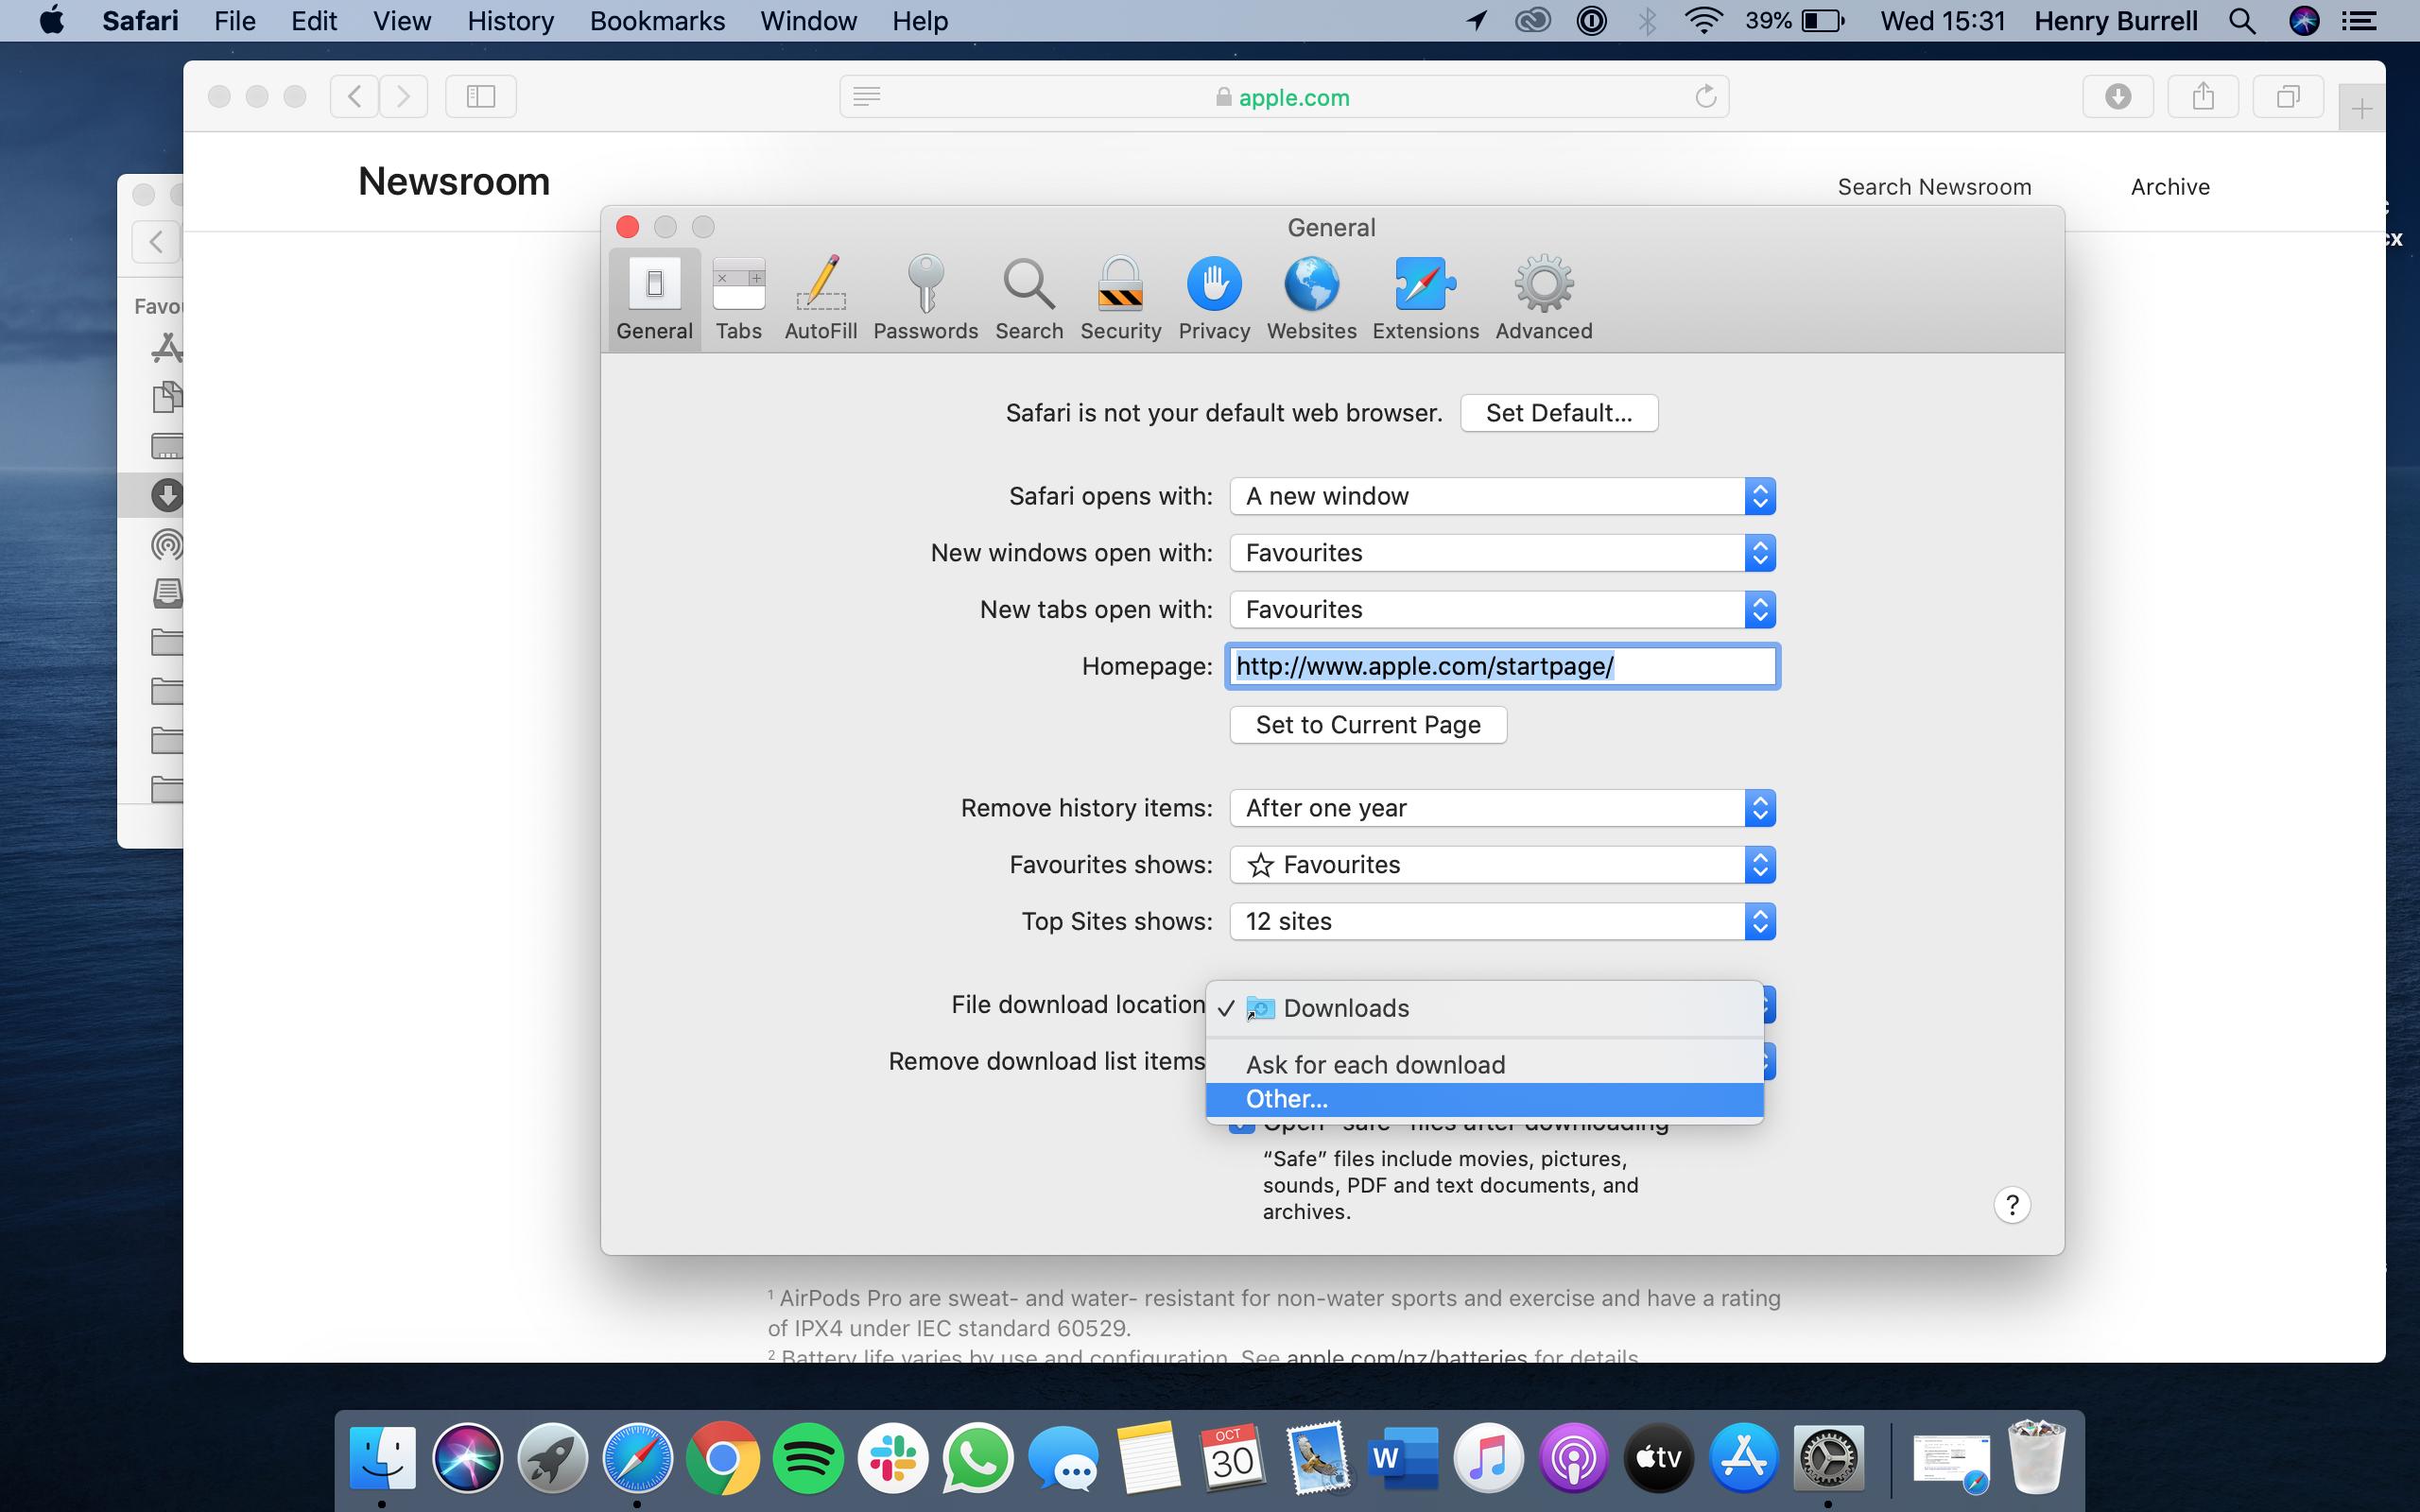 Change storage location of downloads on Mac